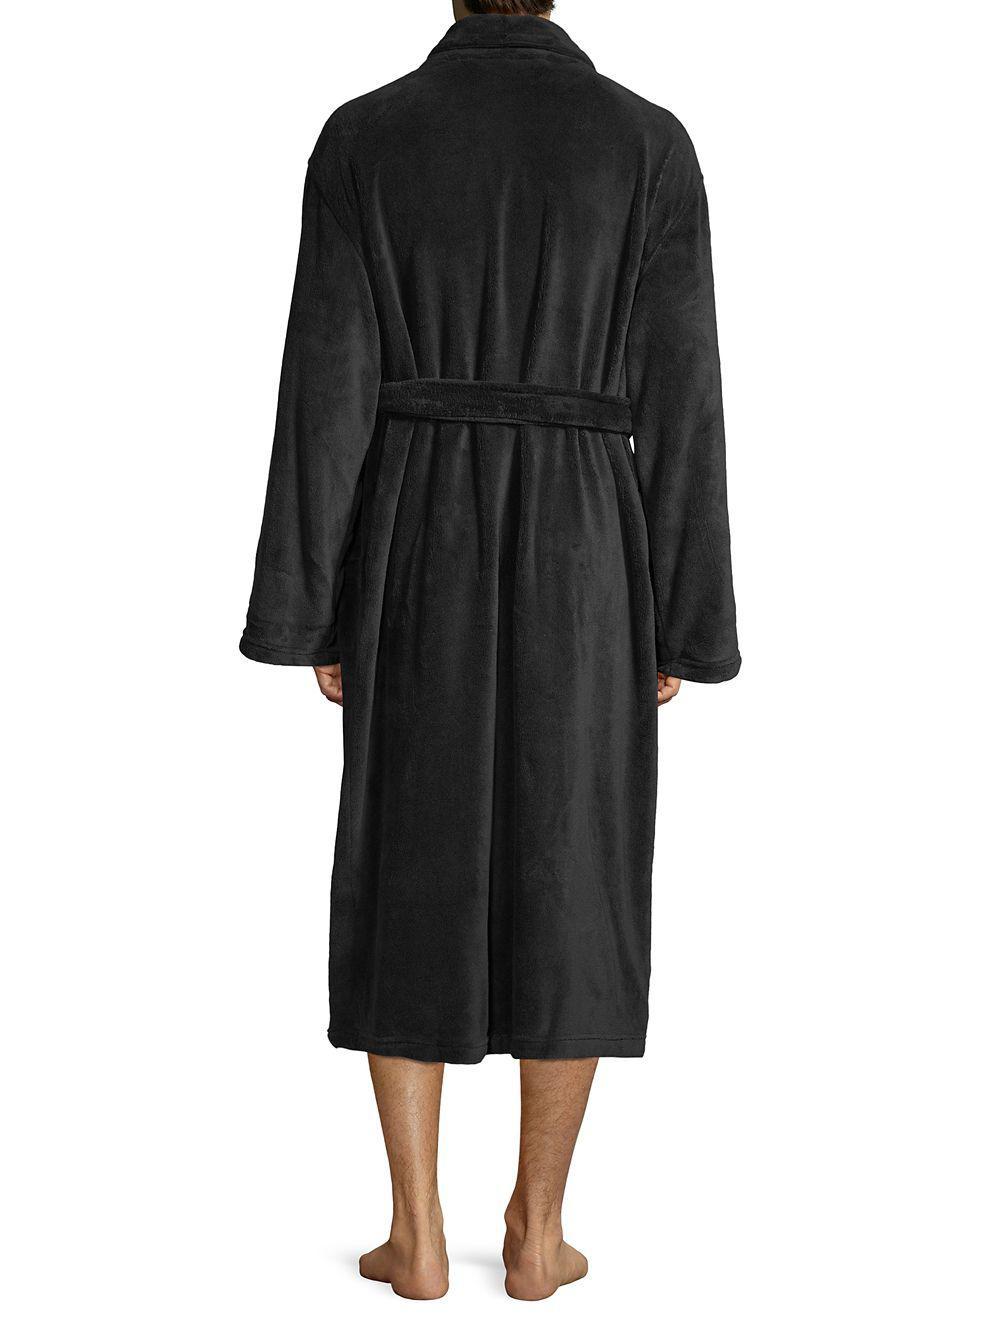 56fada5a05 Polo Ralph Lauren Cotton Fleece Robe in Black for Men - Lyst